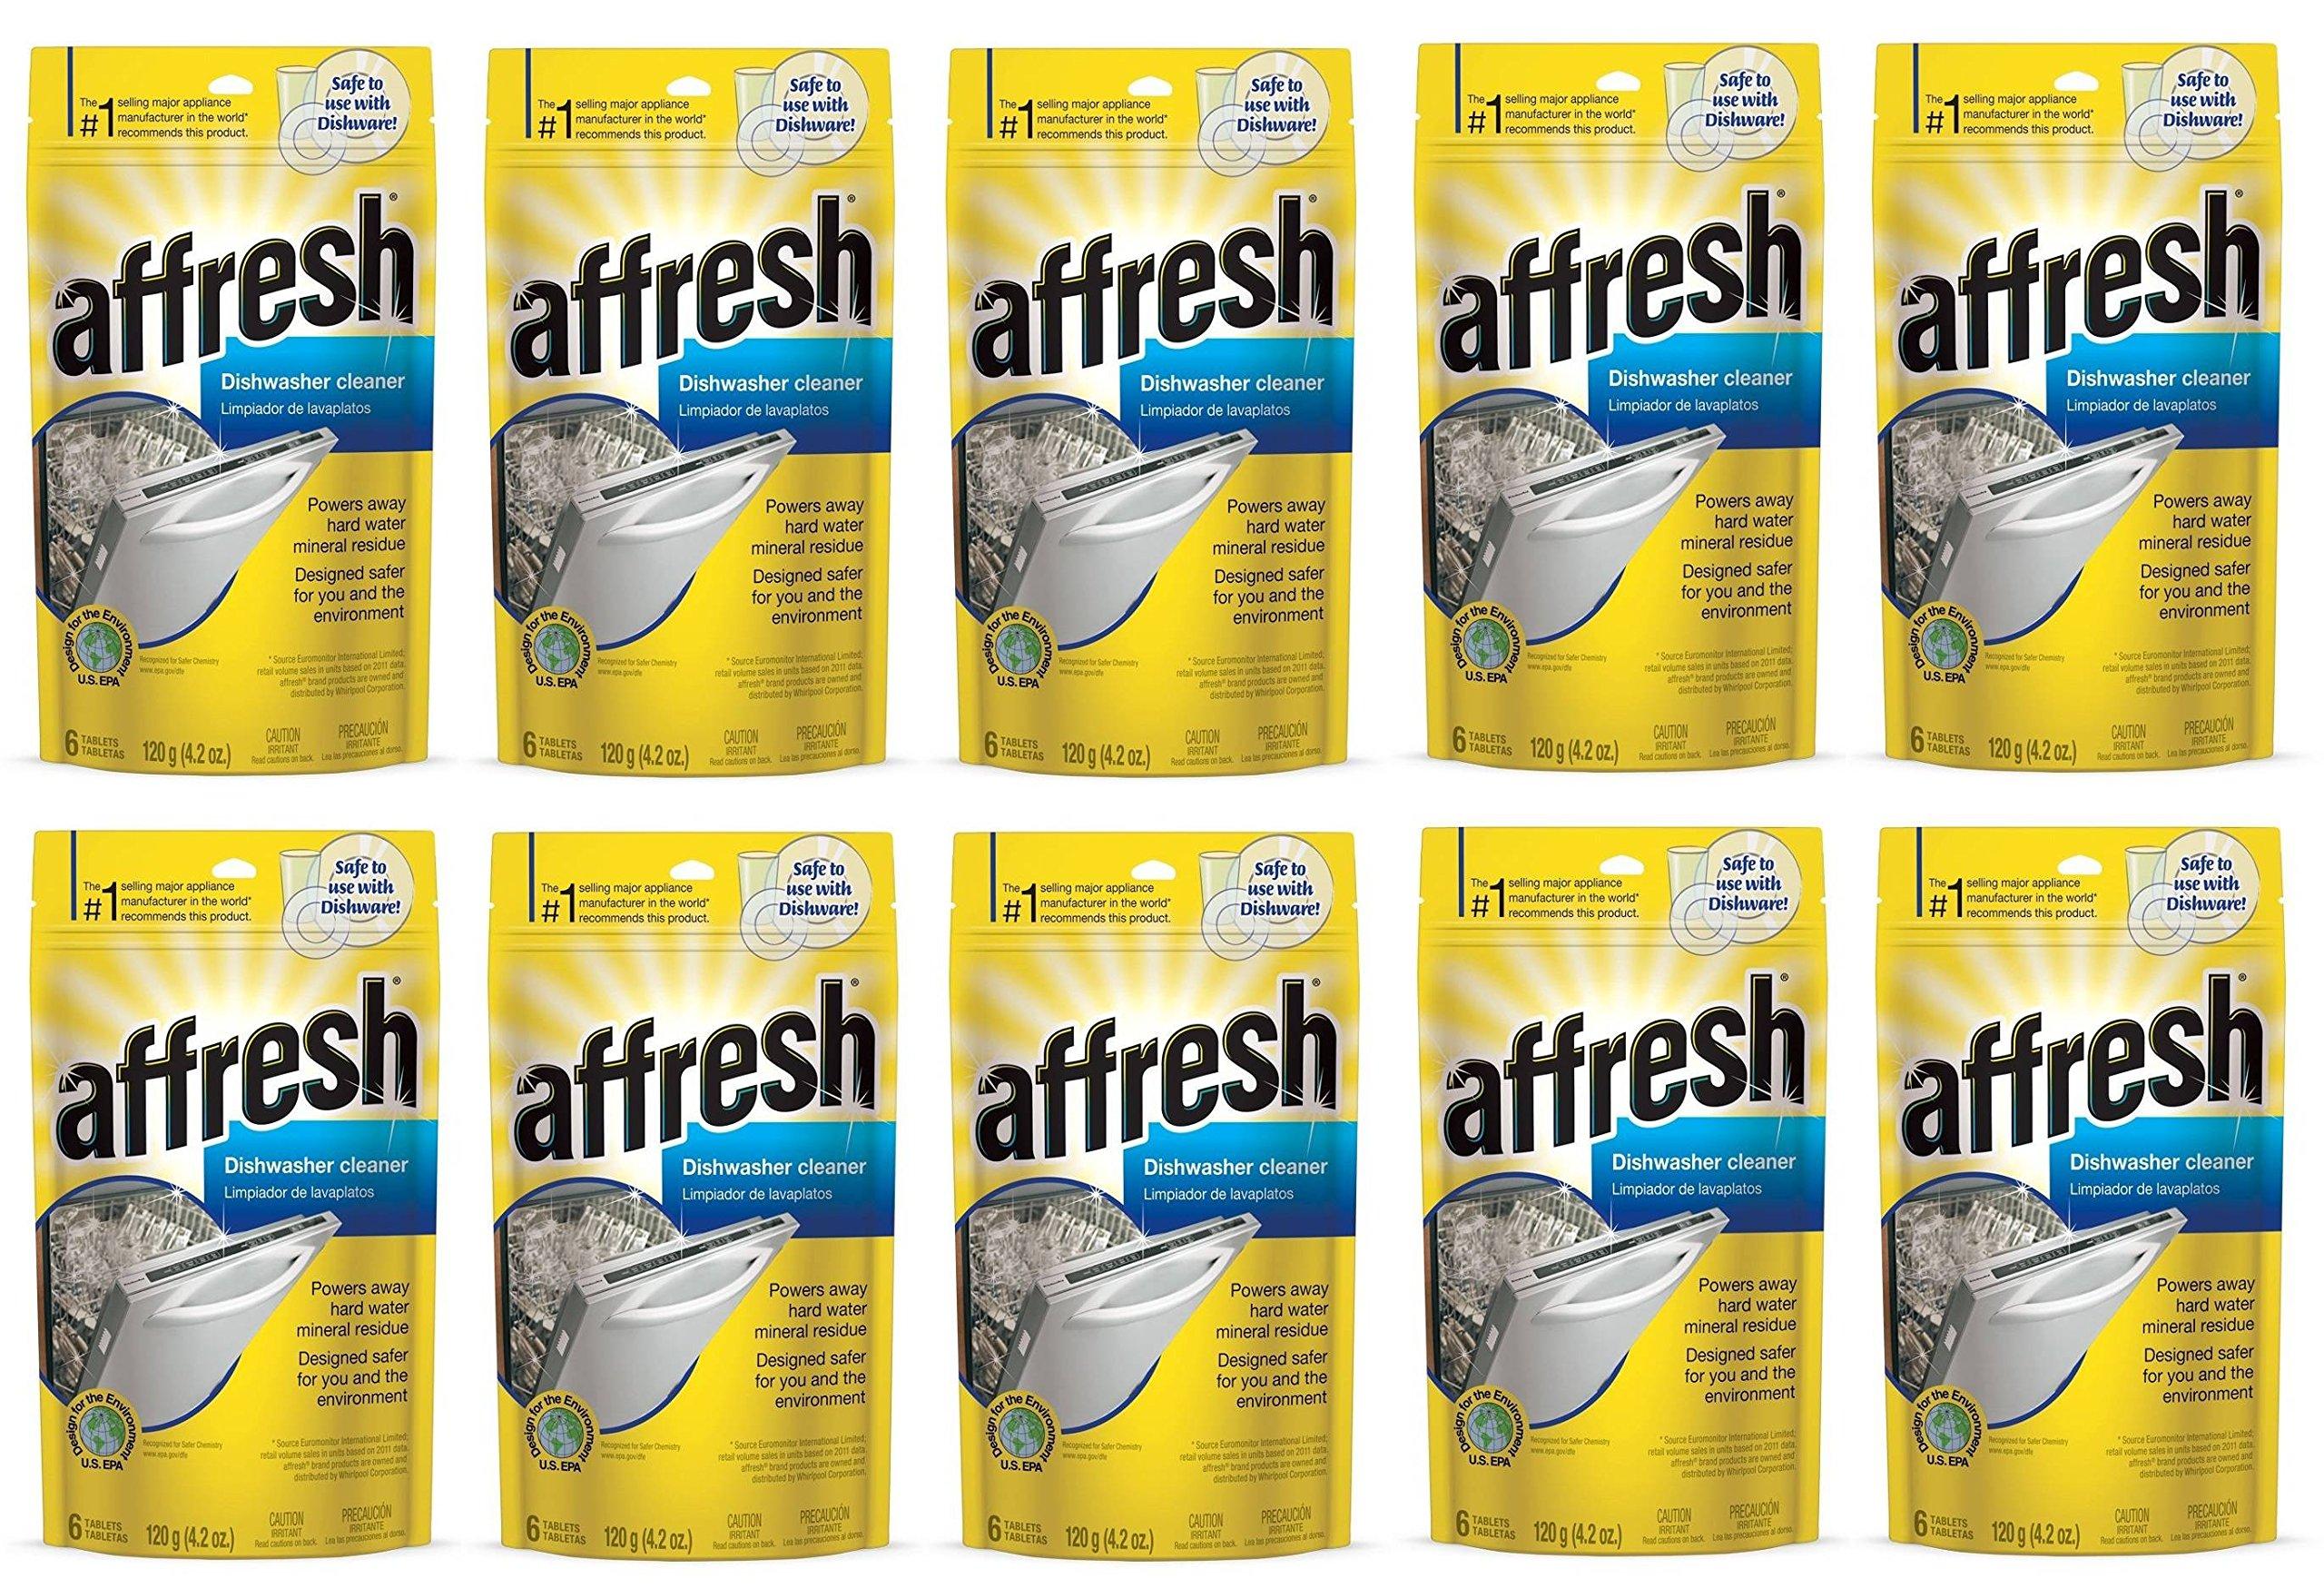 Affresh W10549850 Dishwasher Cleaner KXfYtF, 60 Tablets in Pouch